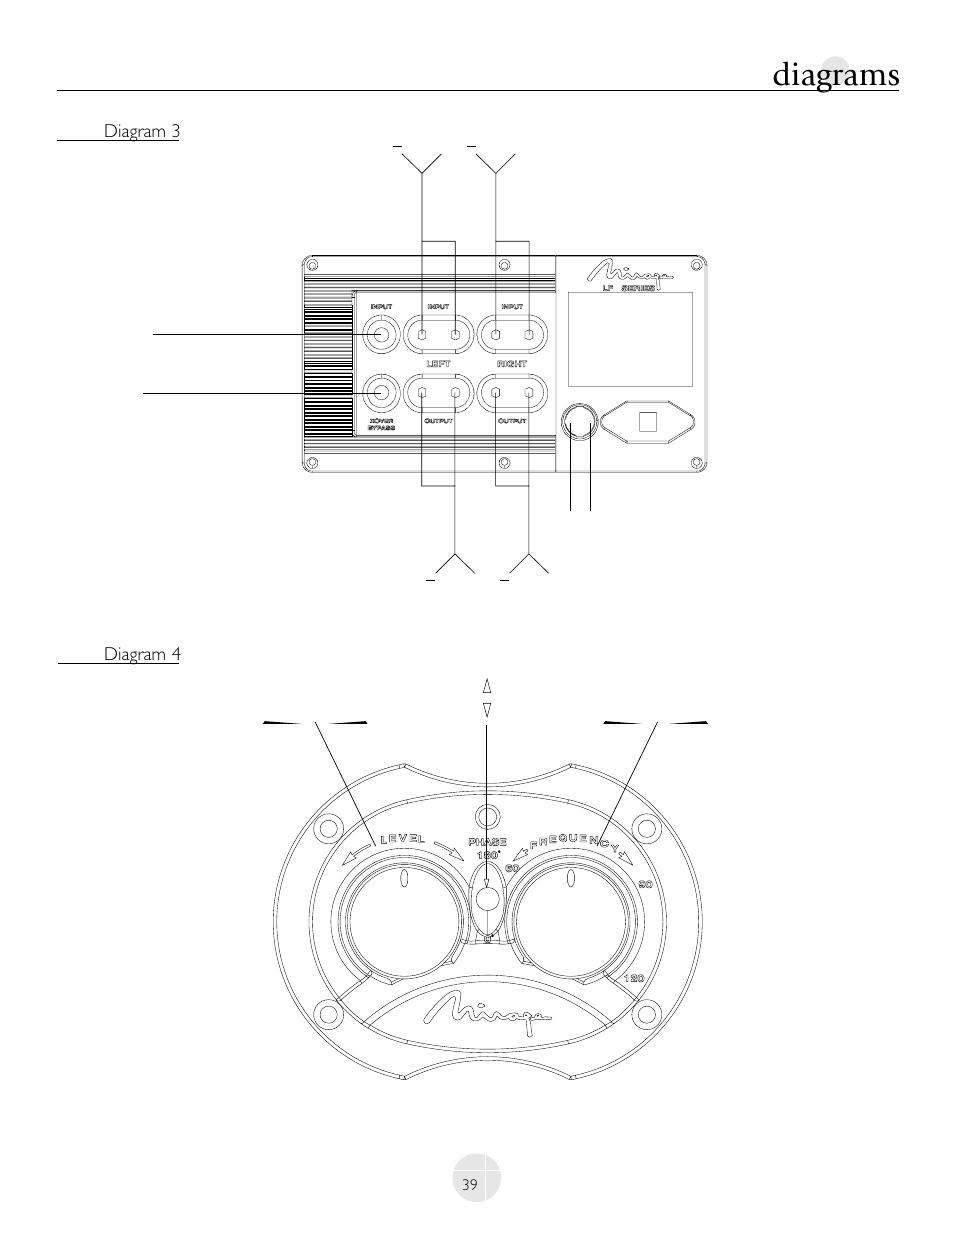 diagrams  diagram 3 diagram 4